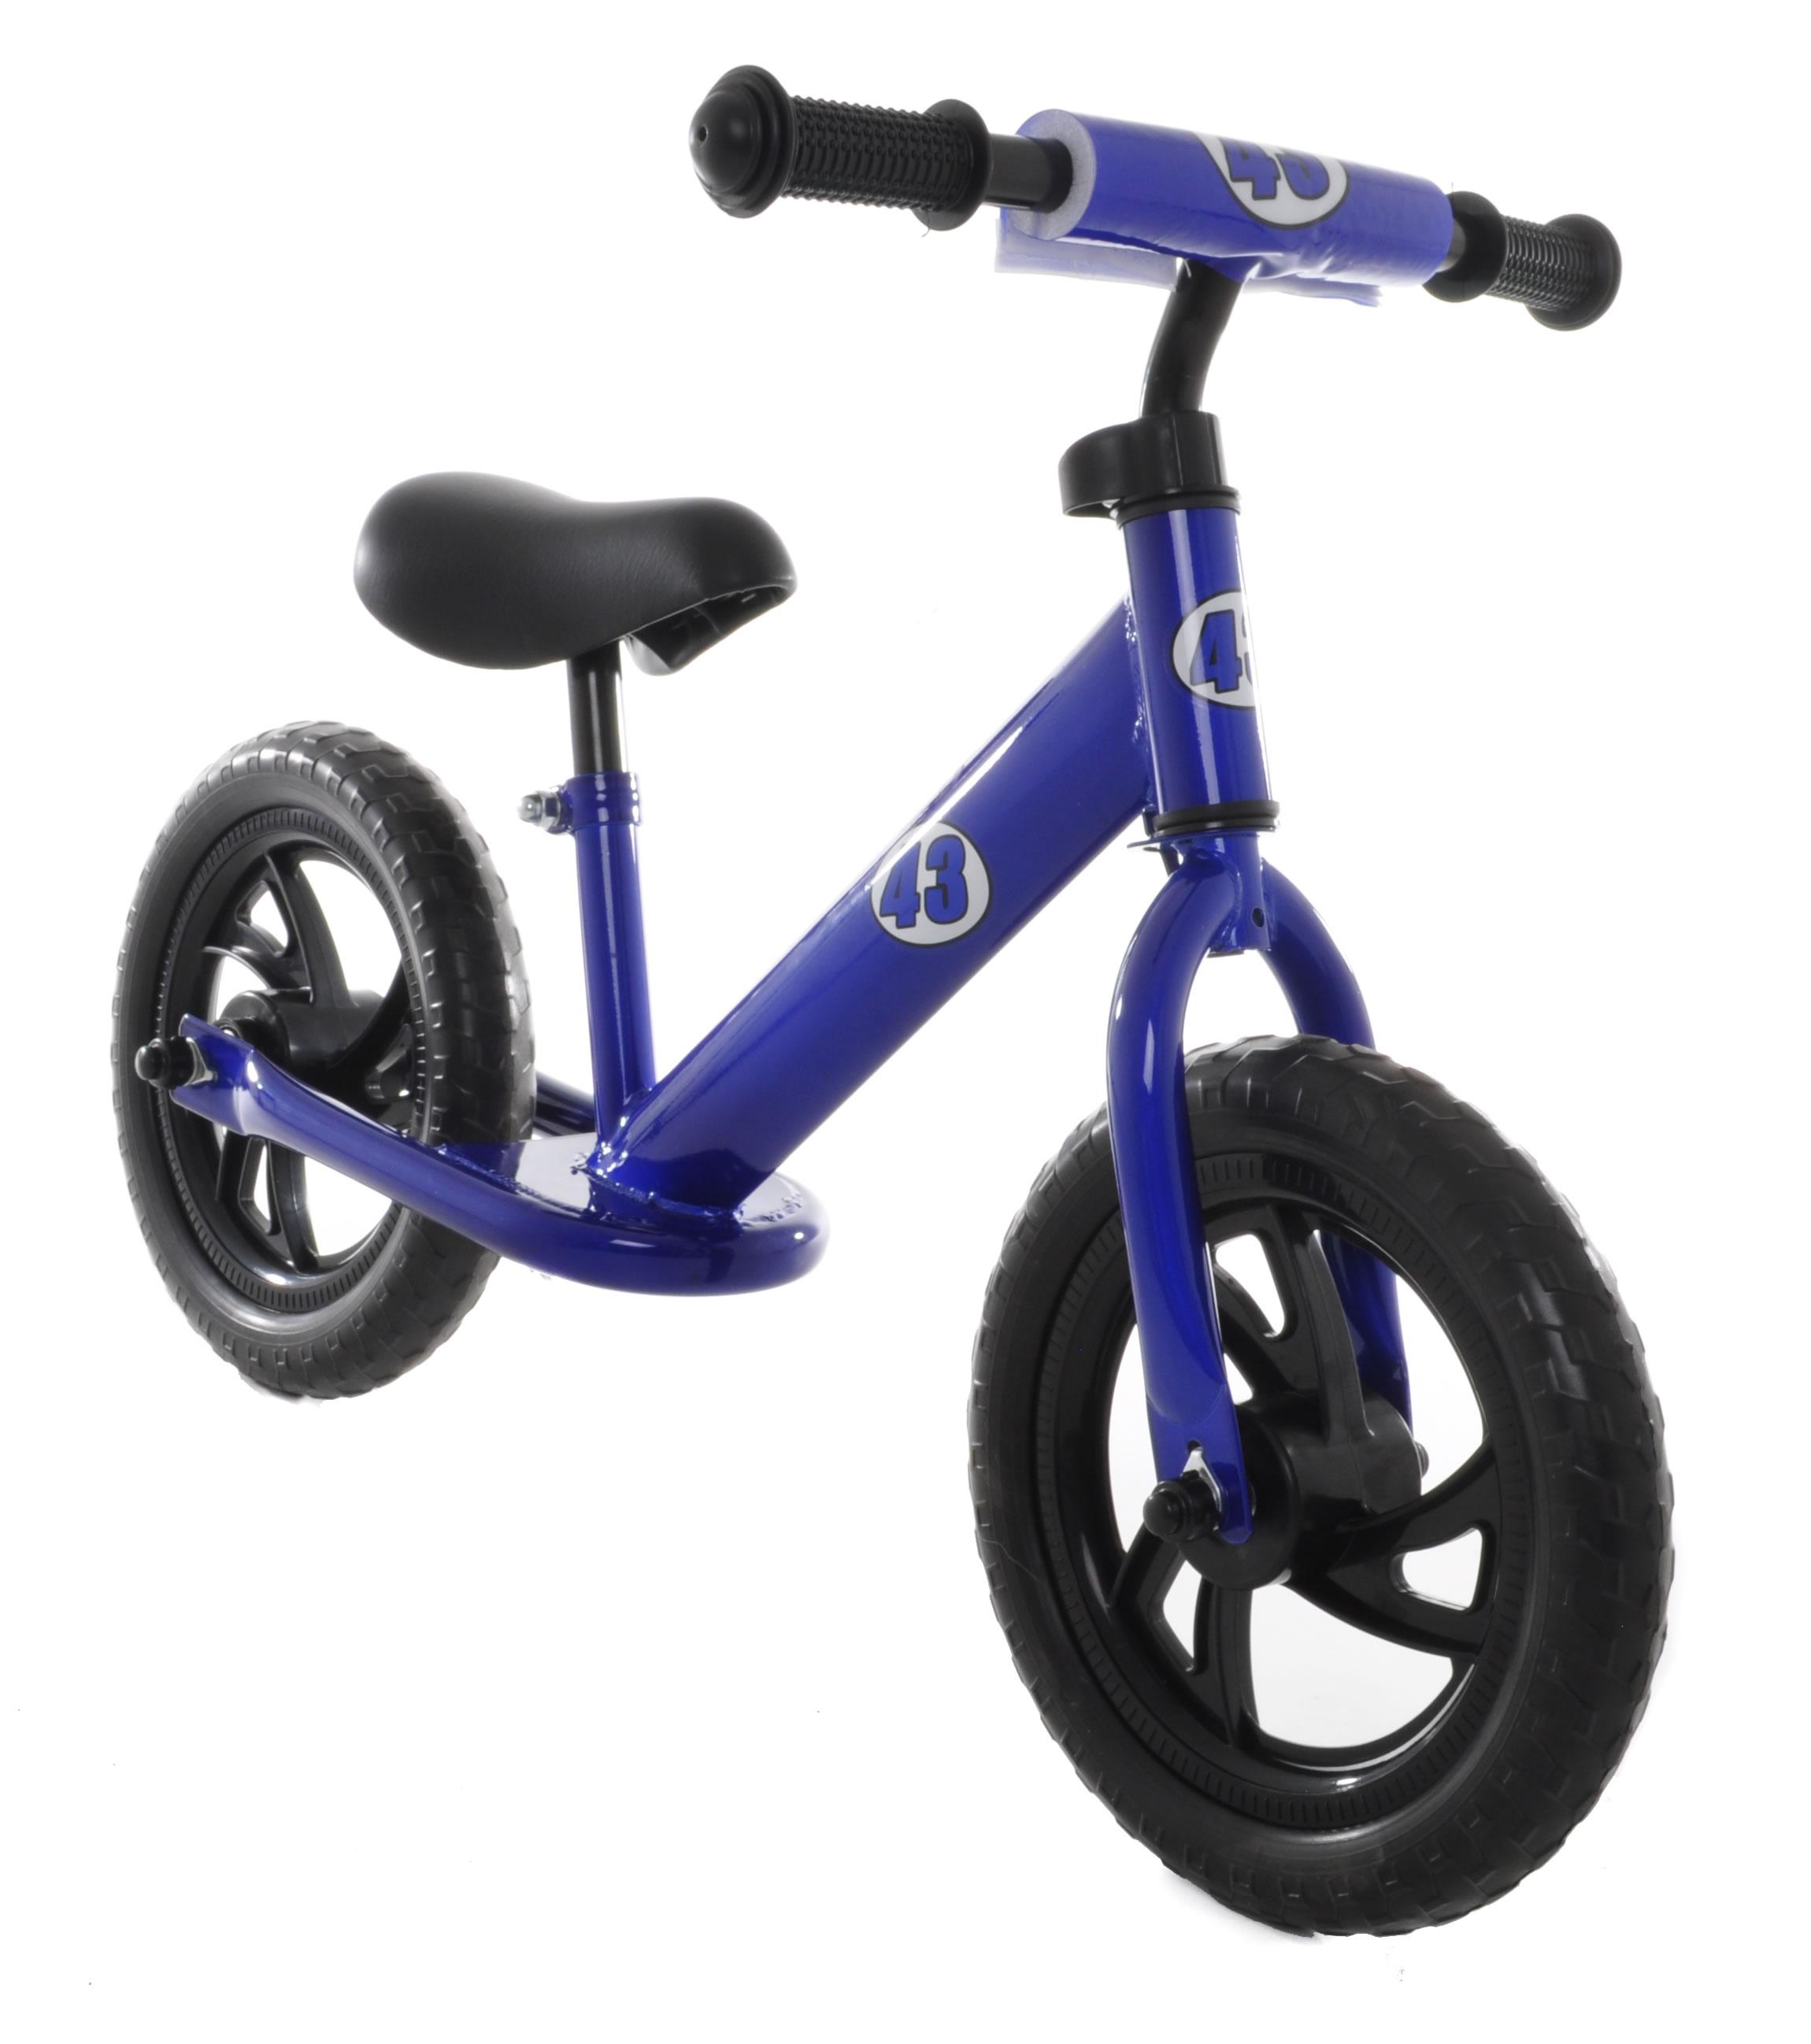 Vilano-Rally-Childrens-Balance-Bike-No-Pedal-Toddler-Push-Bicycle thumbnail 13